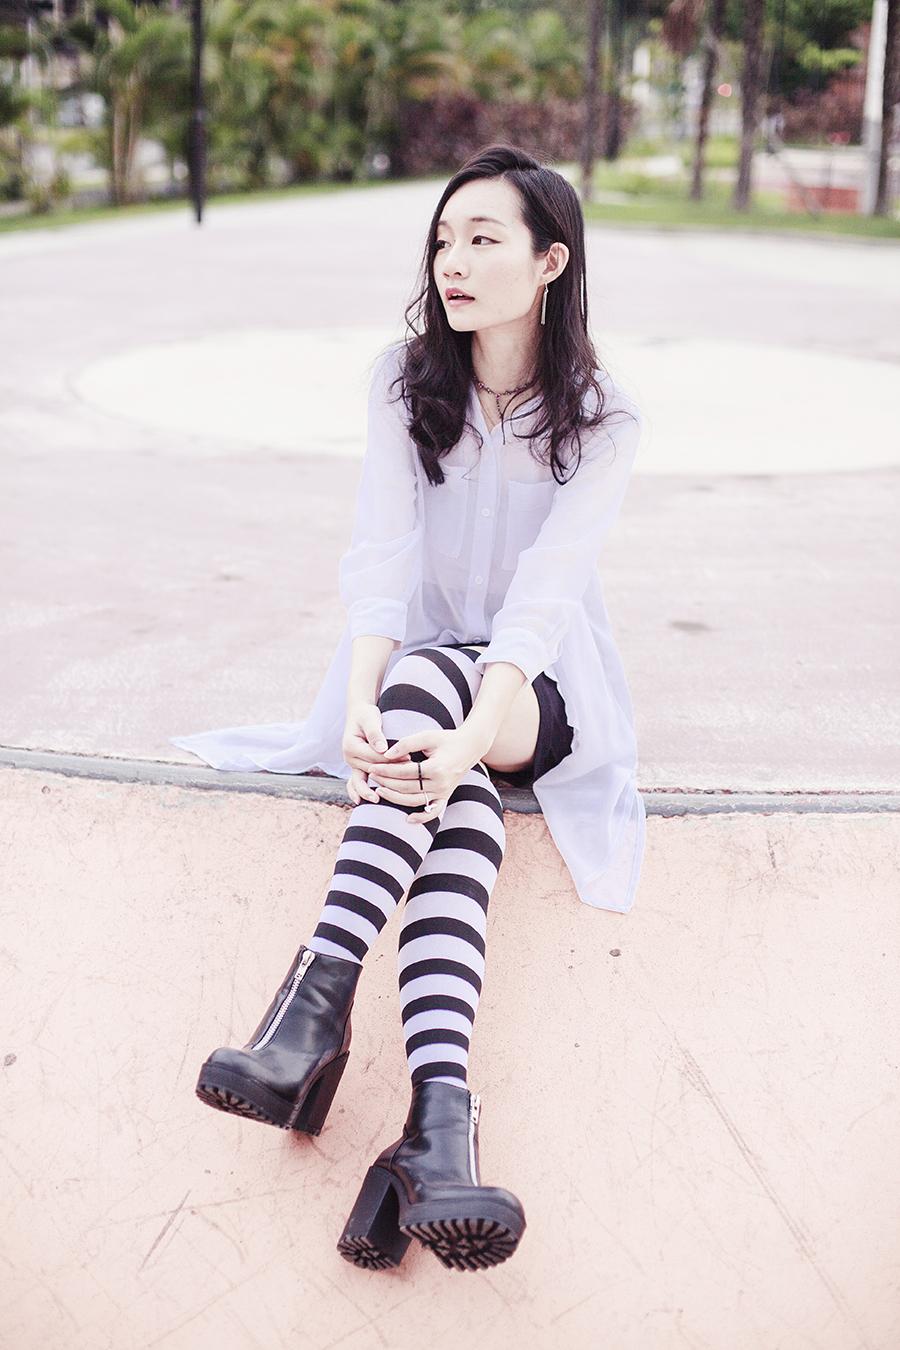 Monochrome ootd: M)phosis white shirt, Forever 21 black skirt, We Love Colors b&w striped thigh high stockings, Rubi black platform boots, Paris Kids rose necklace.